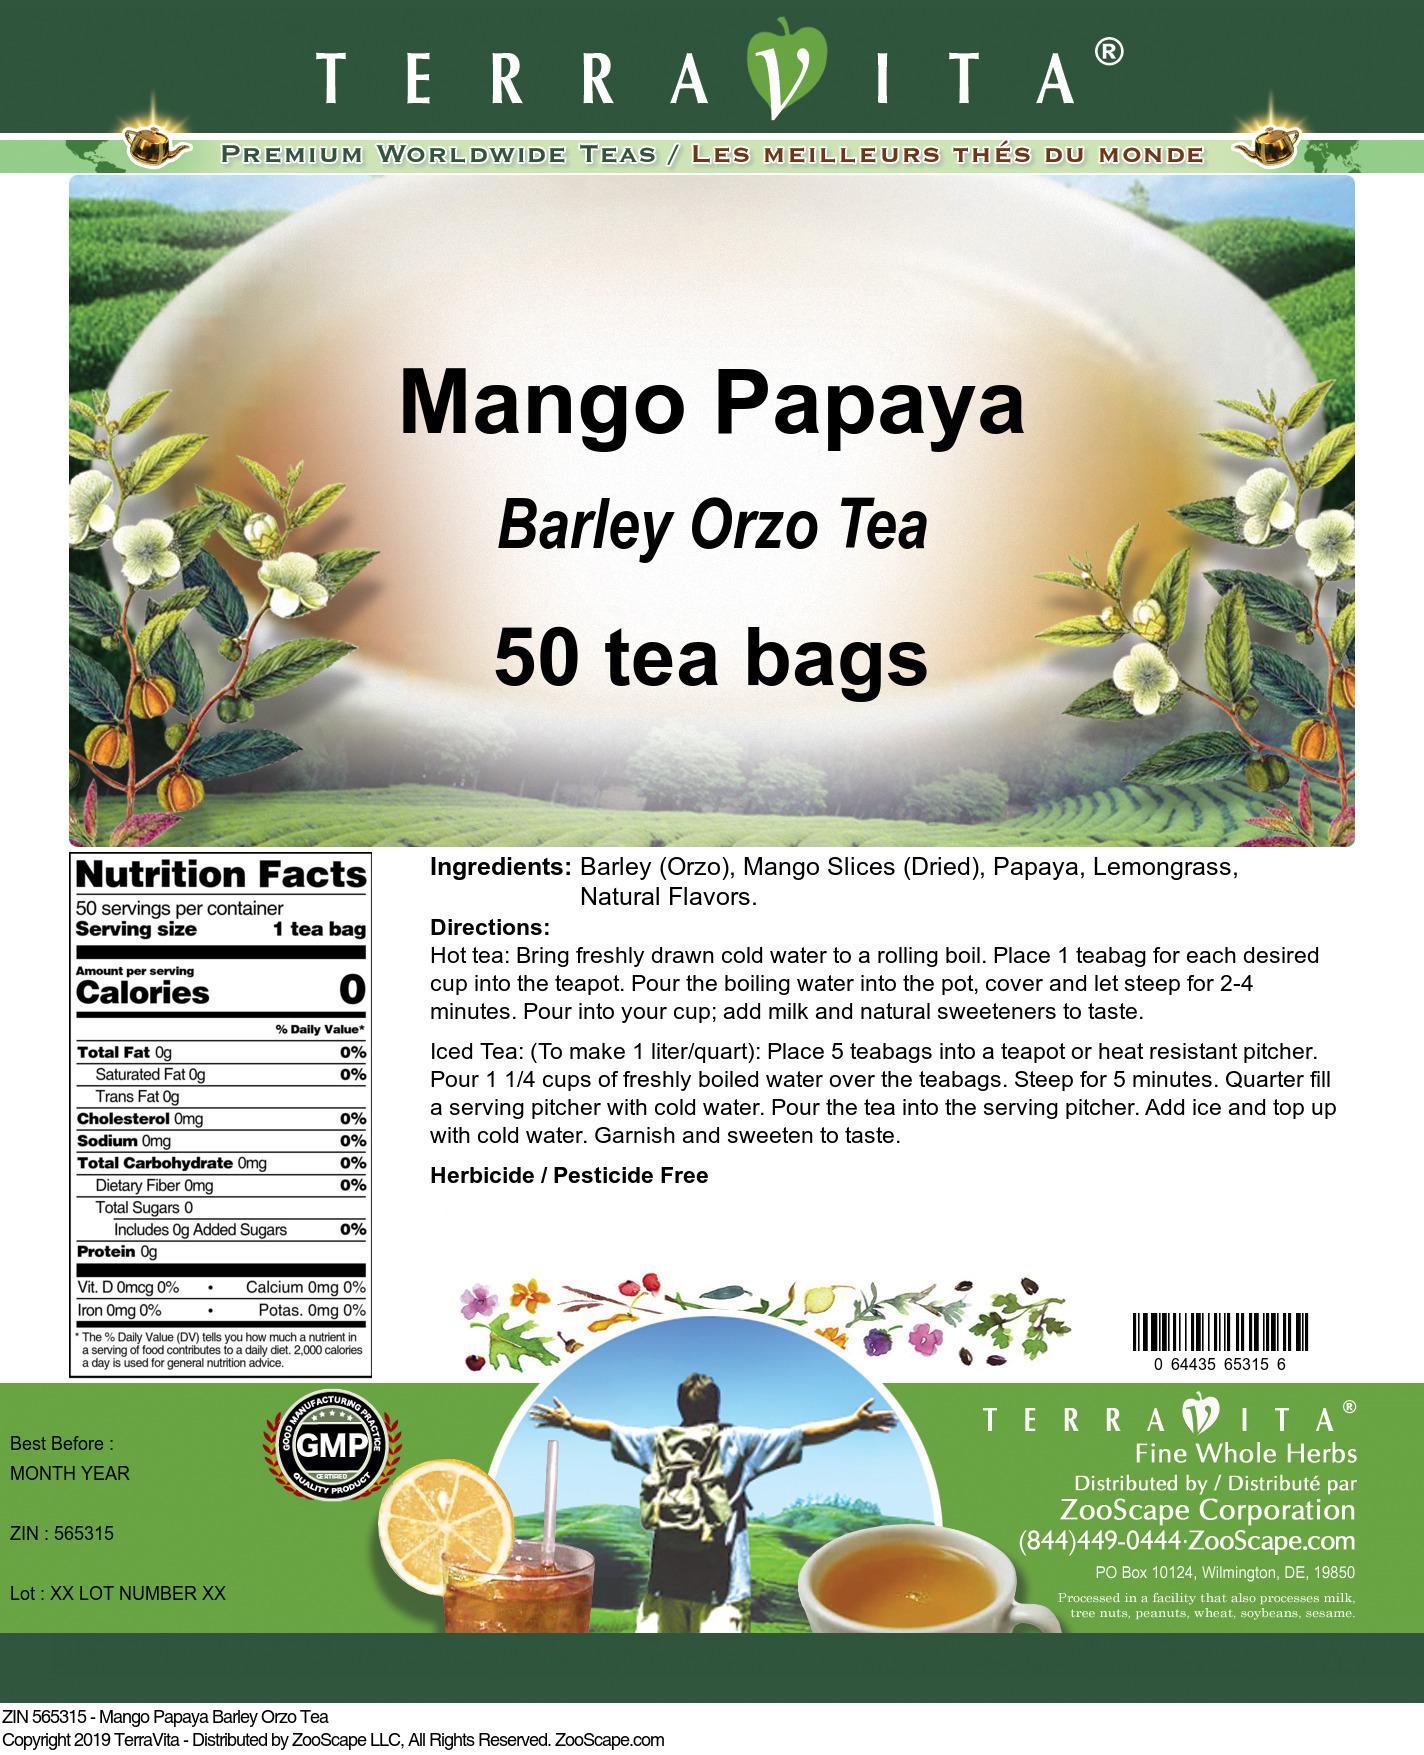 Mango Papaya Barley Orzo Tea